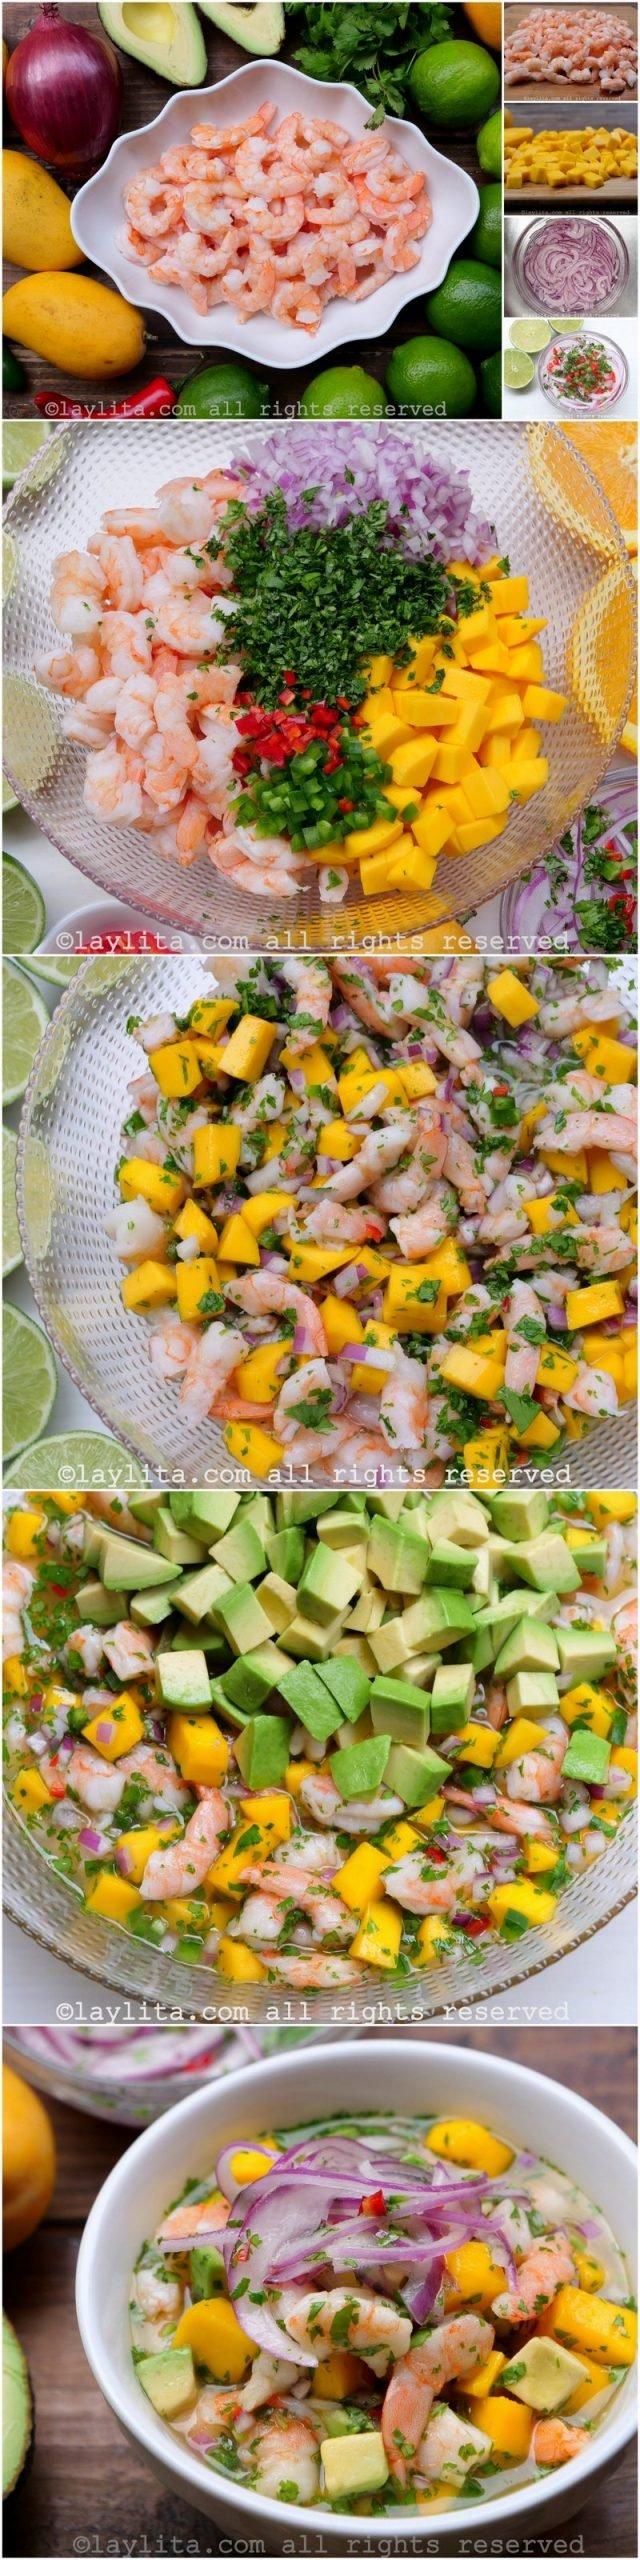 Step by step preparation for shrimp mango ceviche with avocado